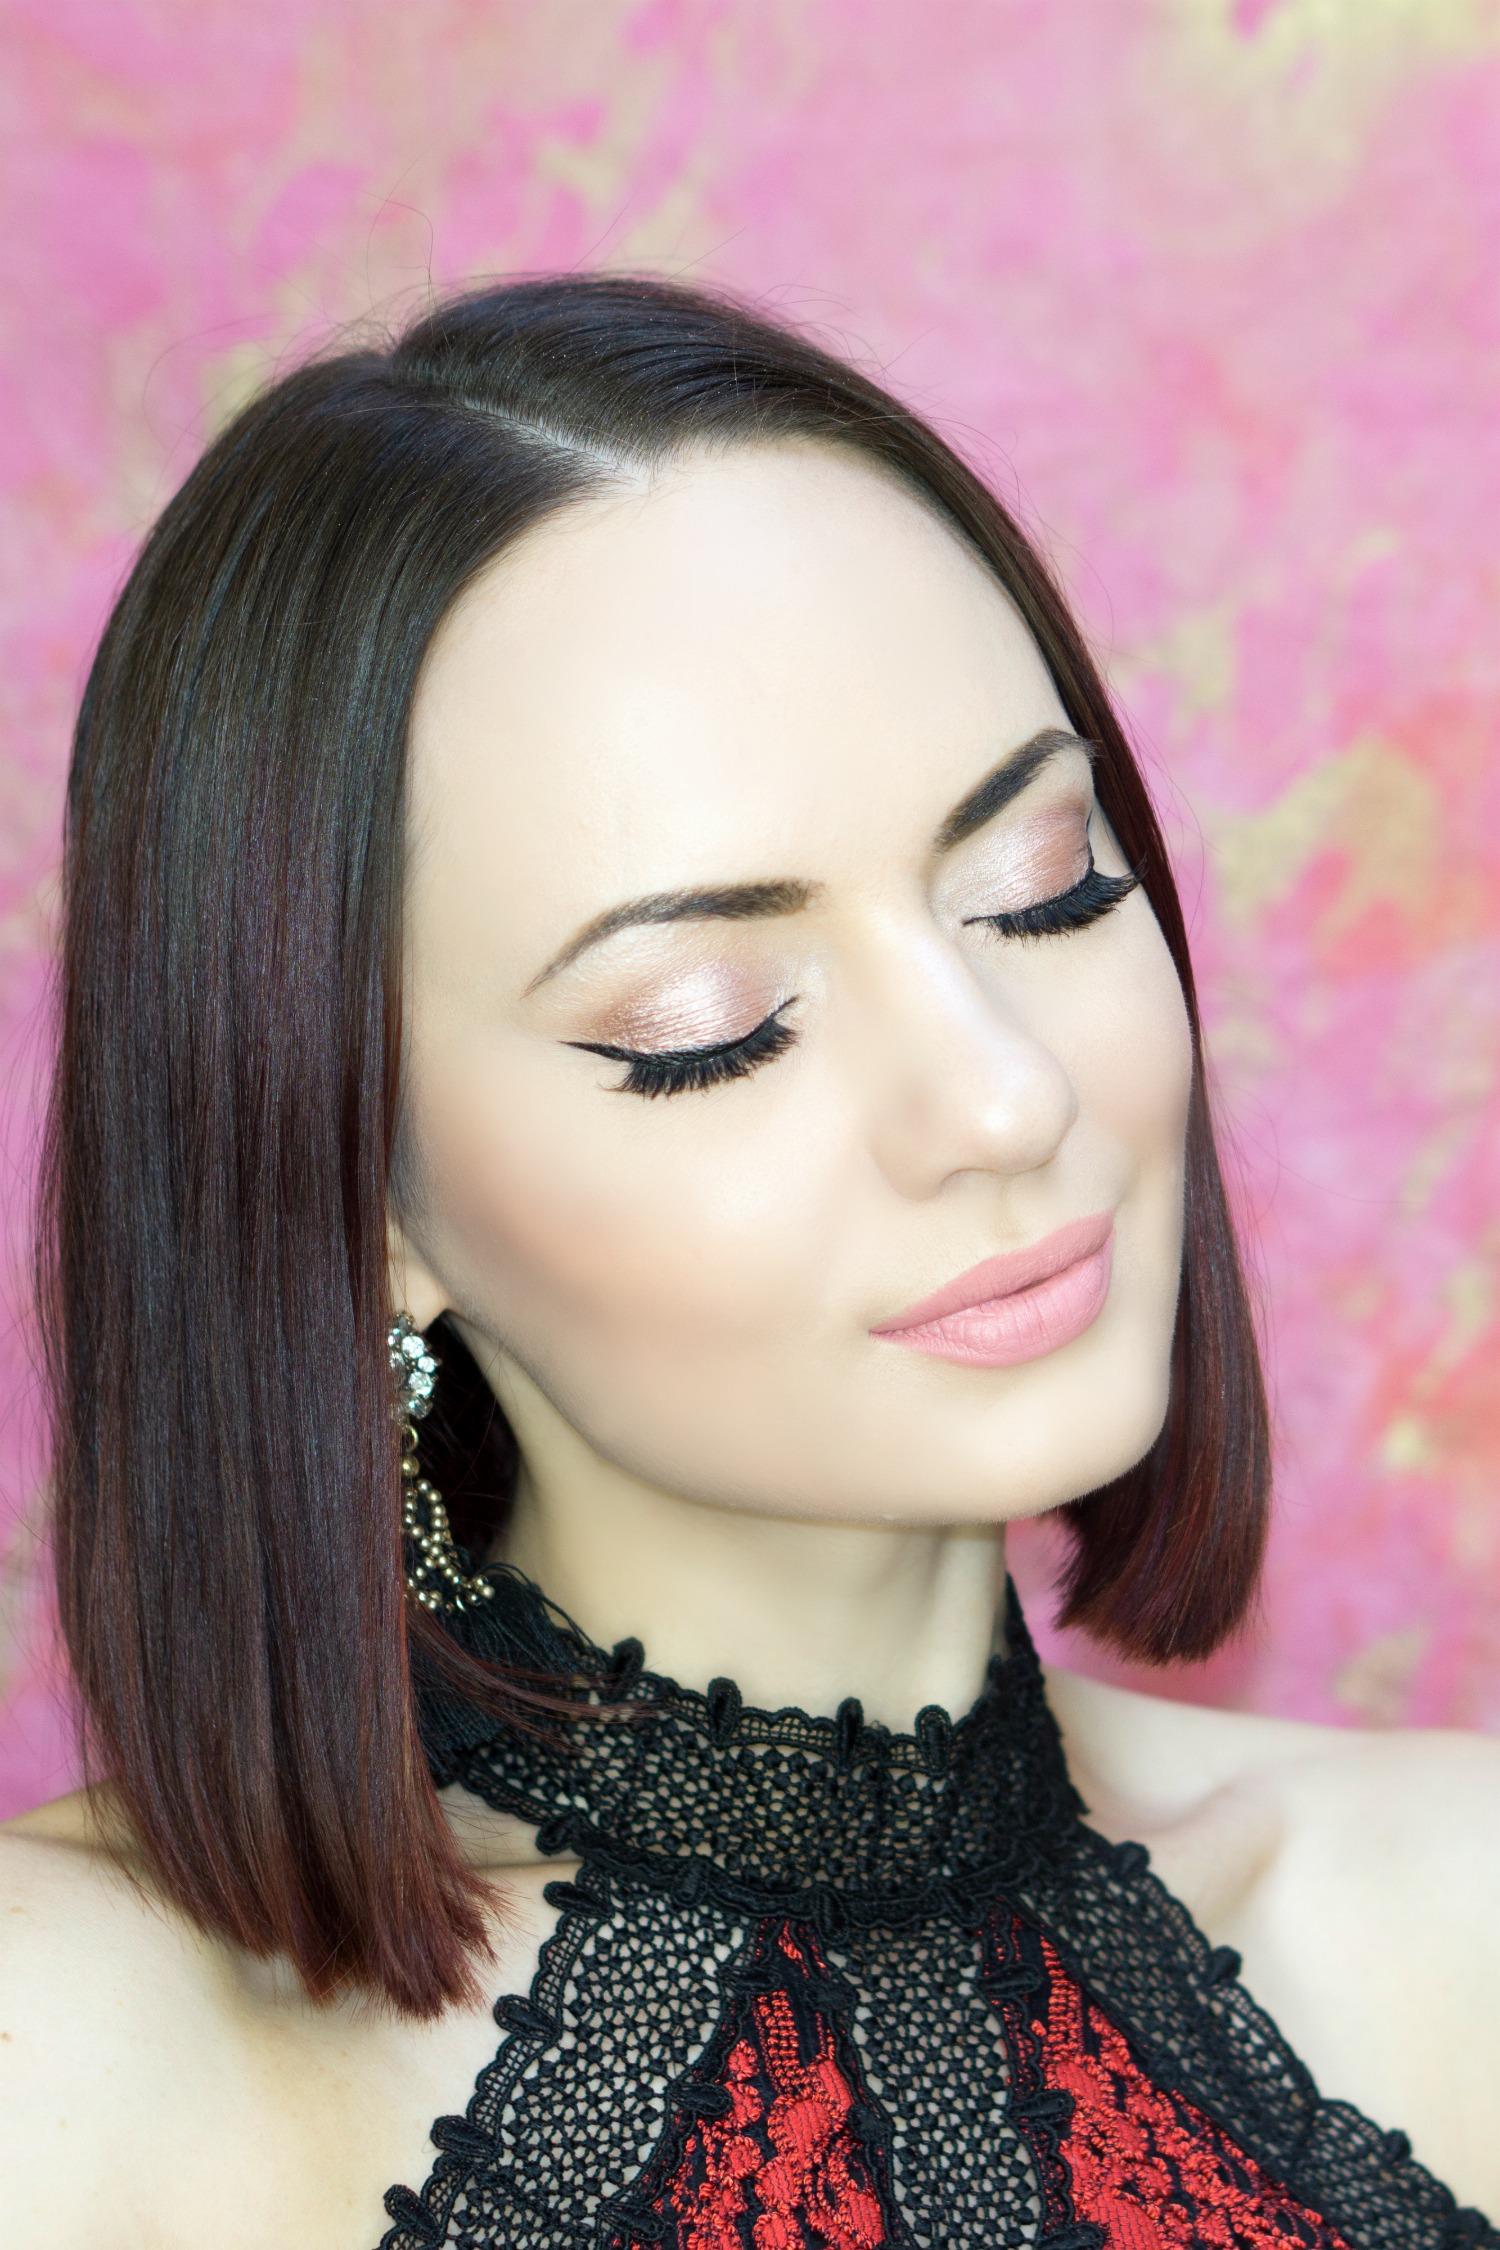 Makeup Tutorial Using 21 Days of Beauty Deals 3